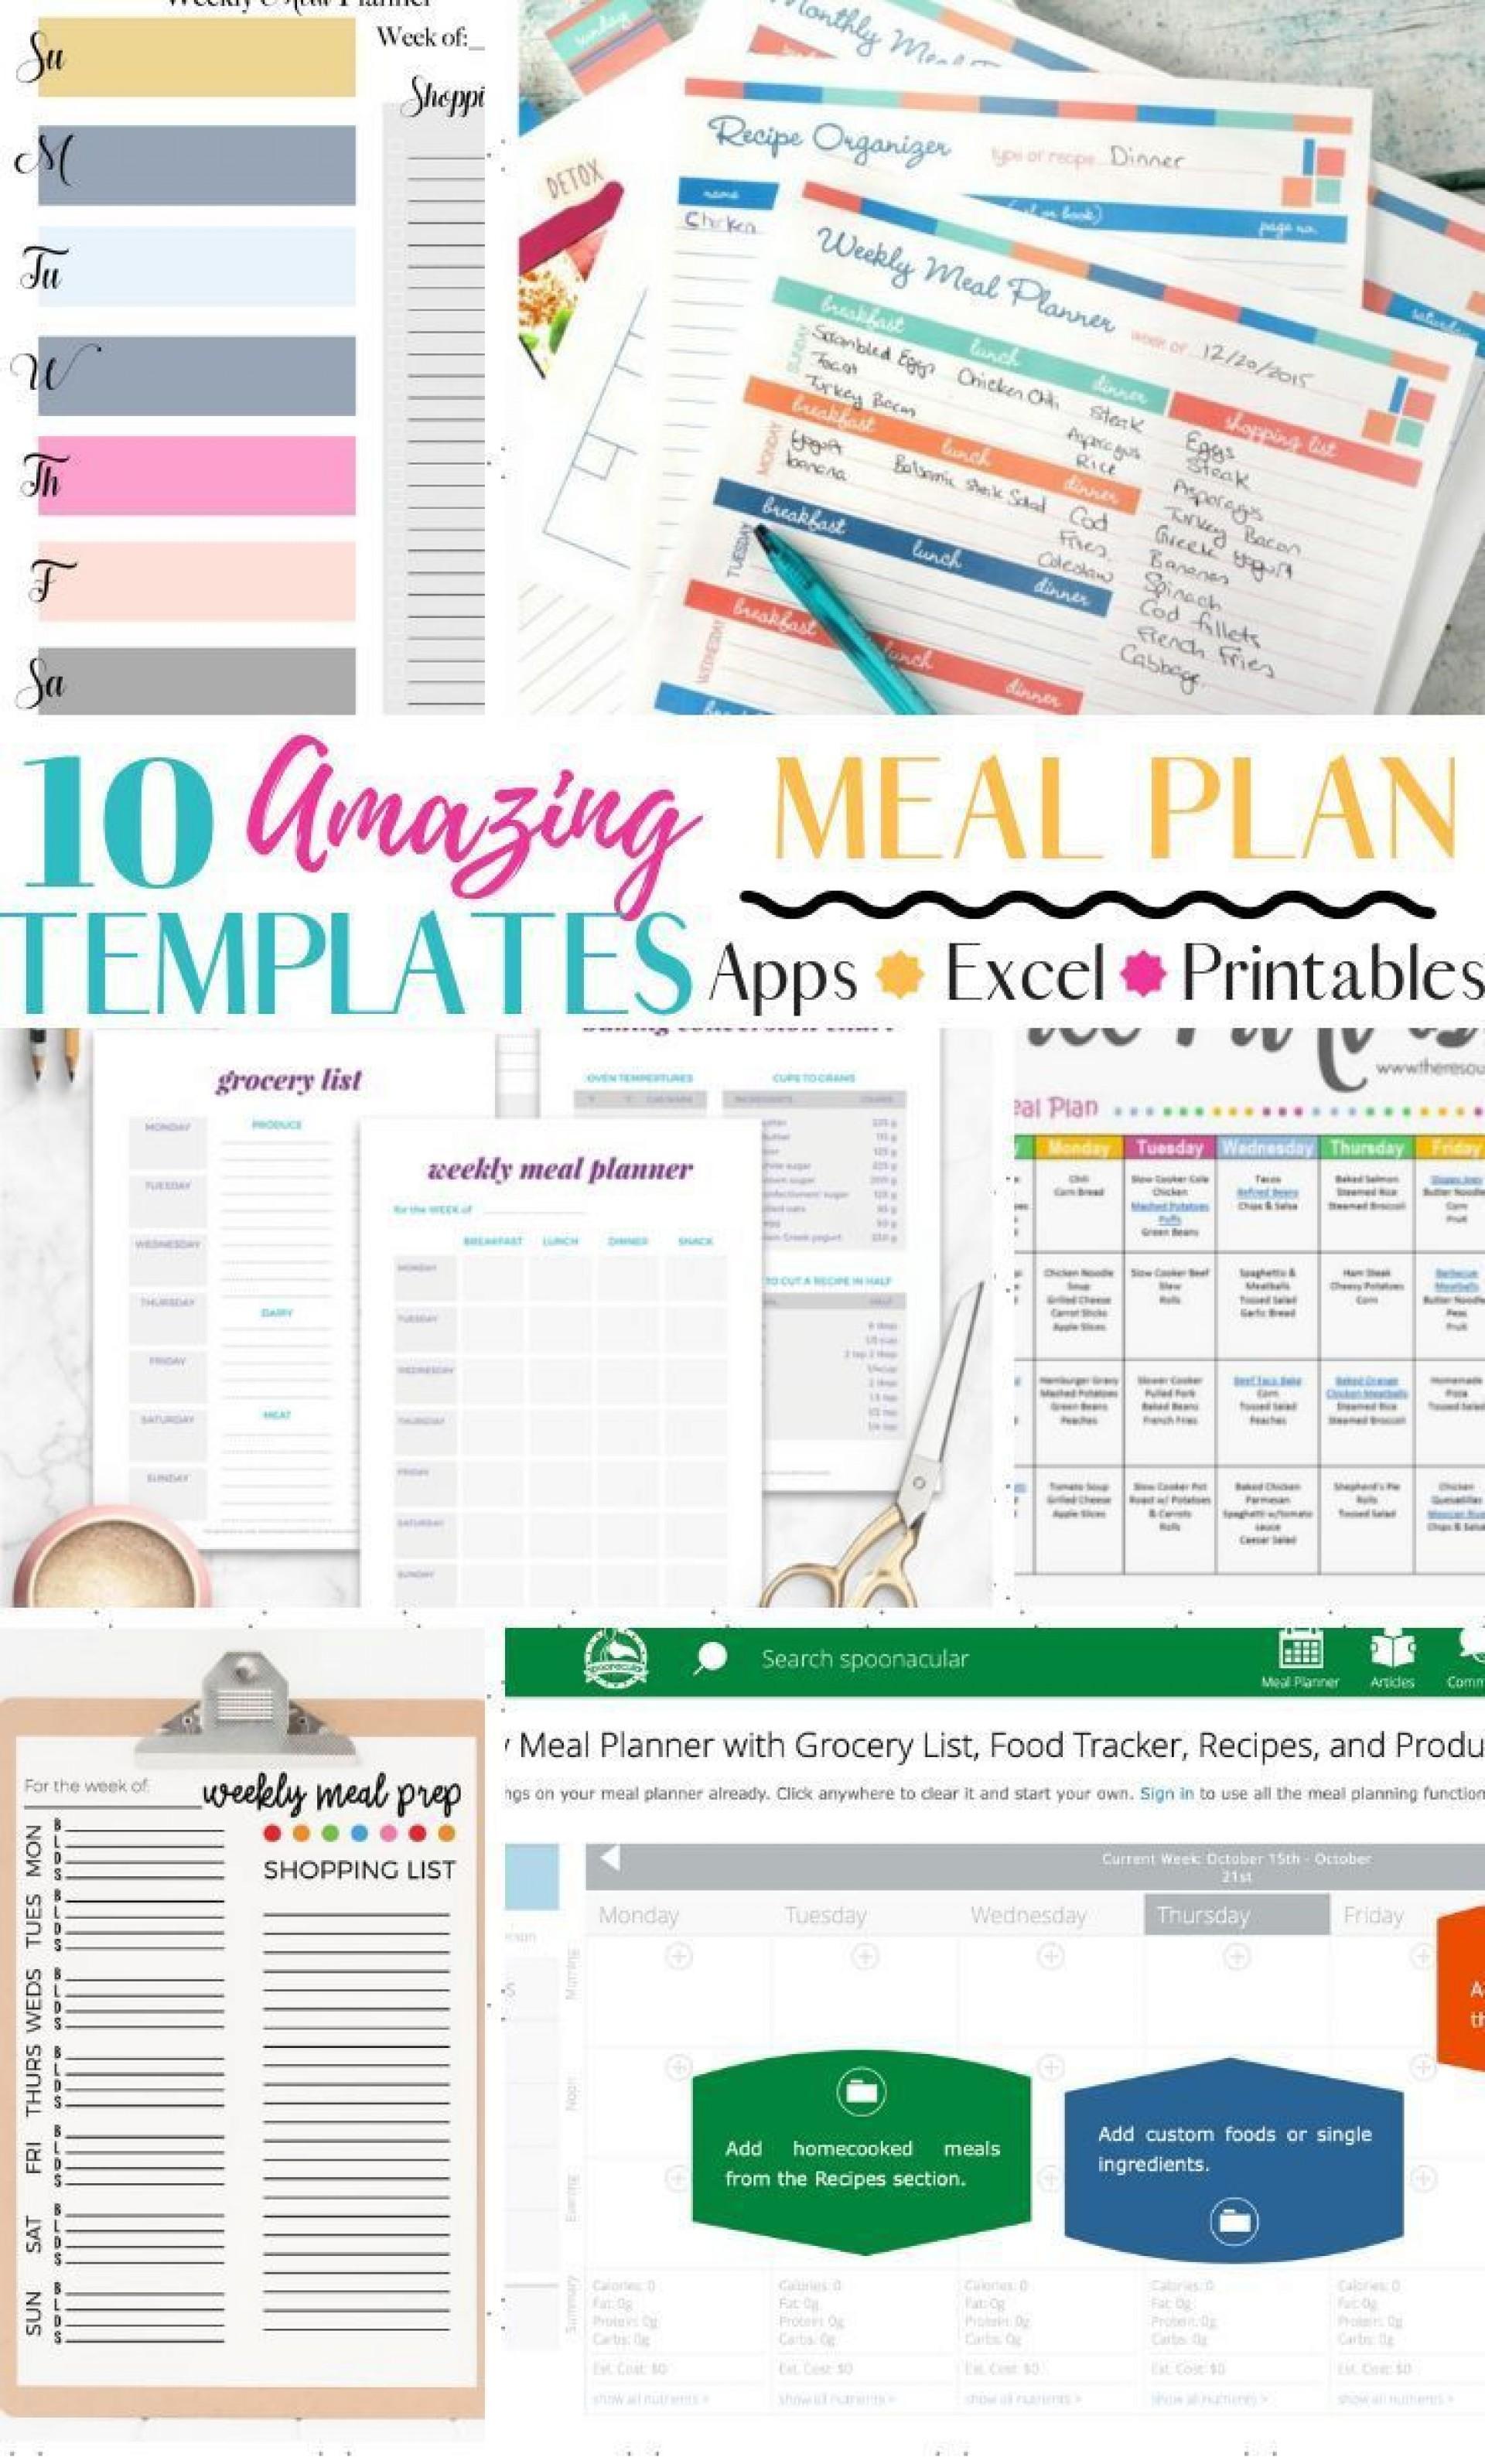 004 Striking Weekly Meal Plan Template App Photo  Apple Page1920